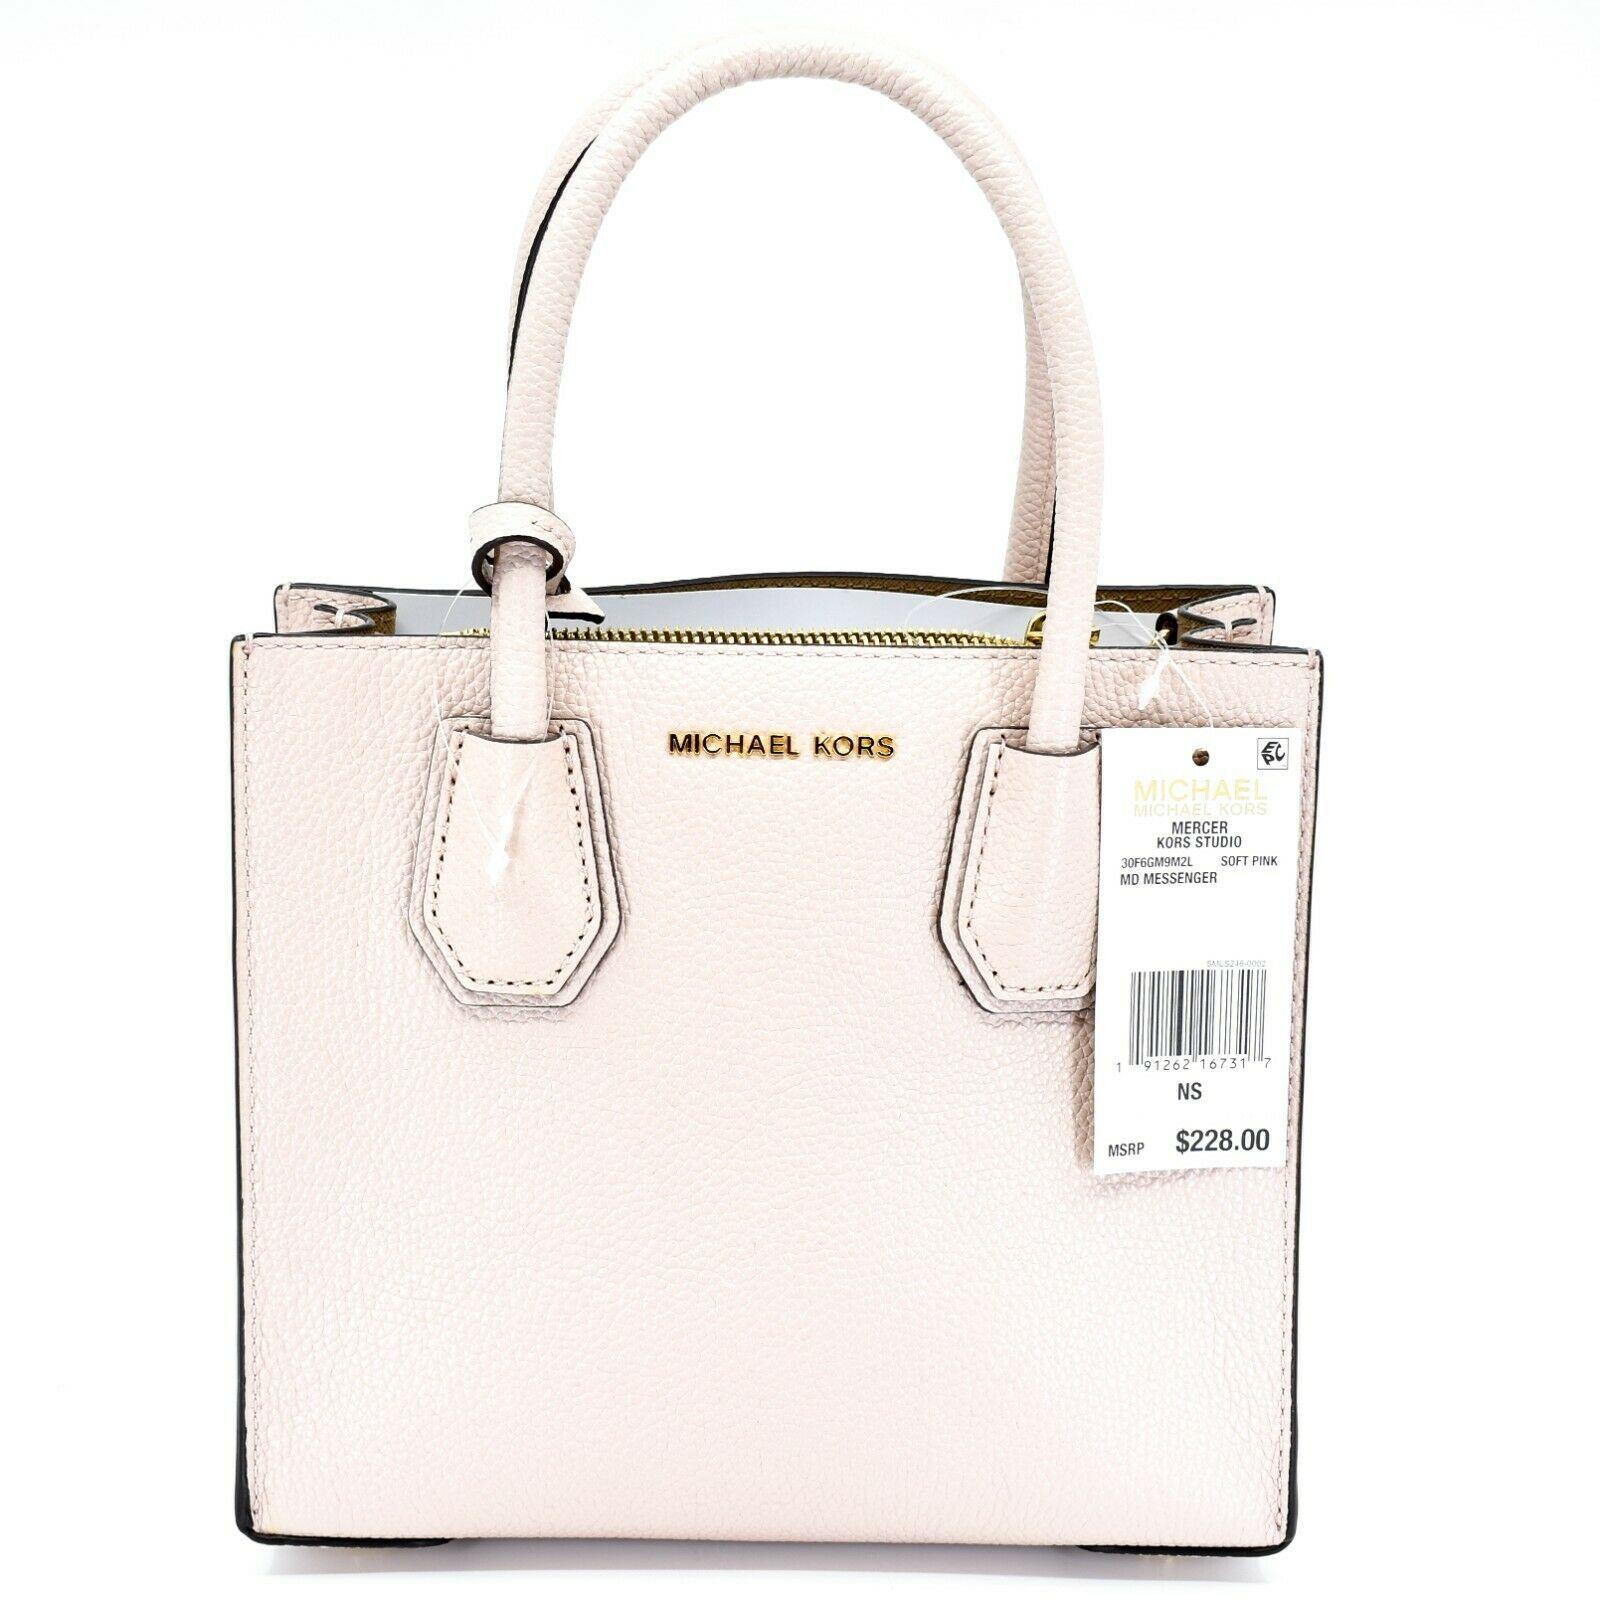 Michael Kors Mercer Soft Pink Pebbled Leather Medium Crossbody Messenger Bag